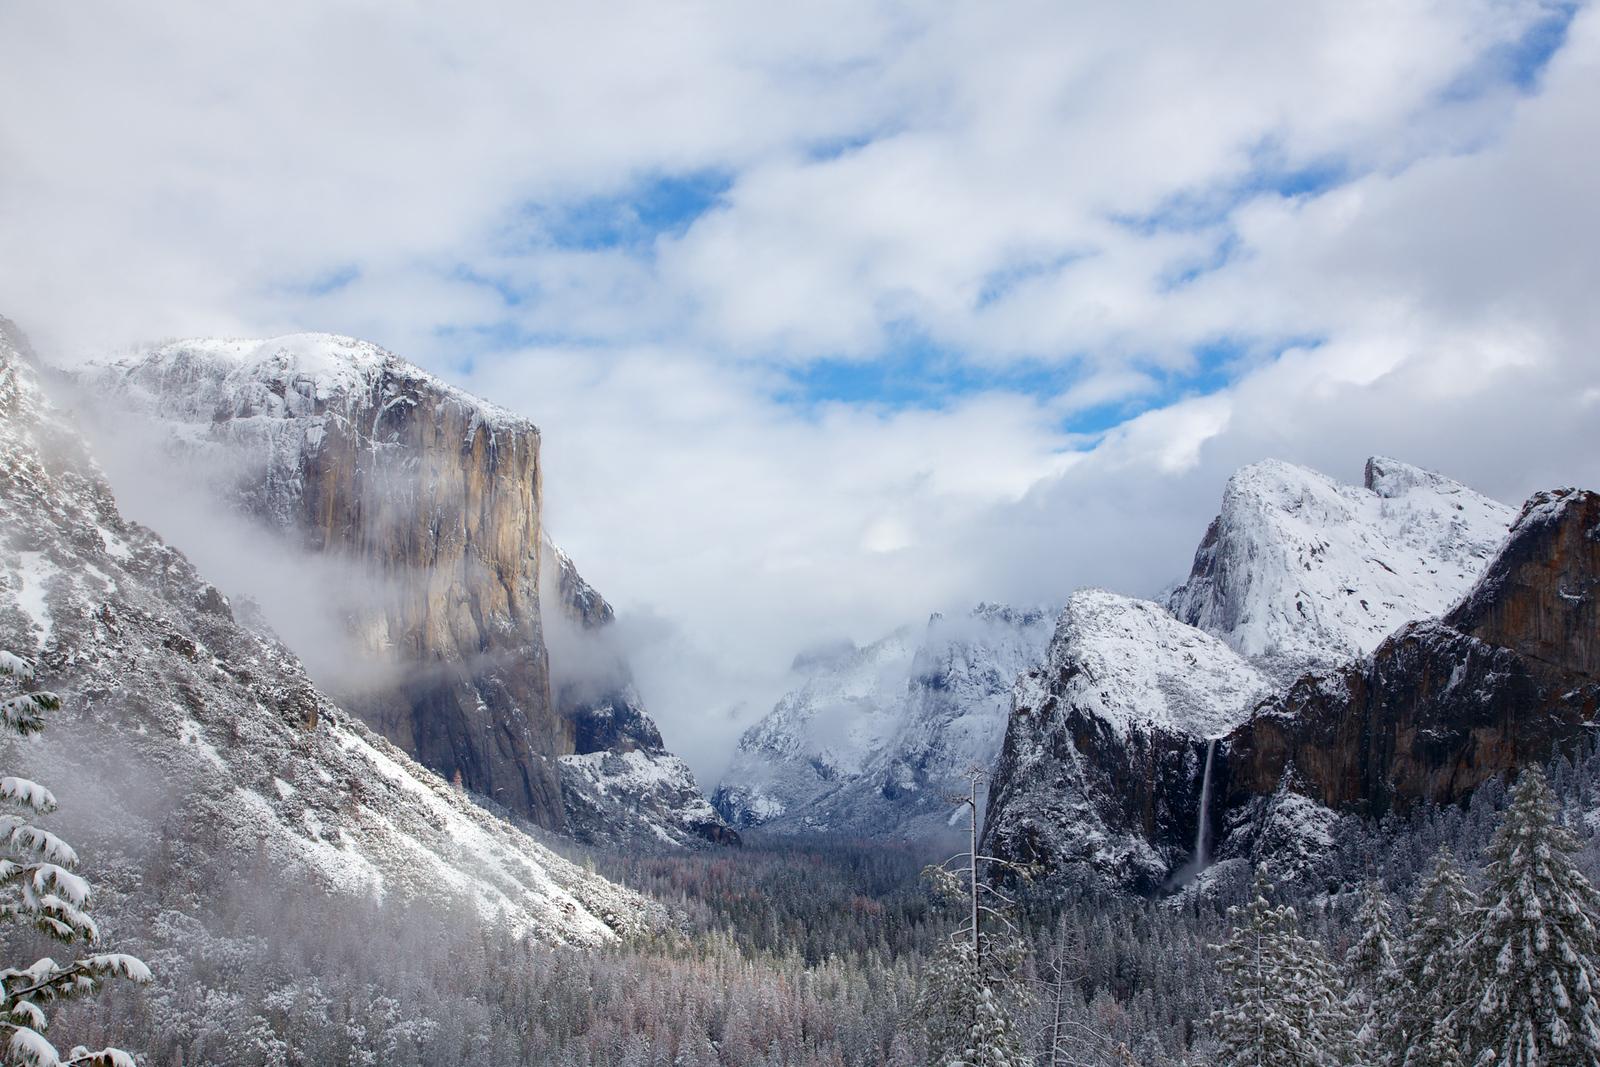 Family_012117_Yosemite_6130